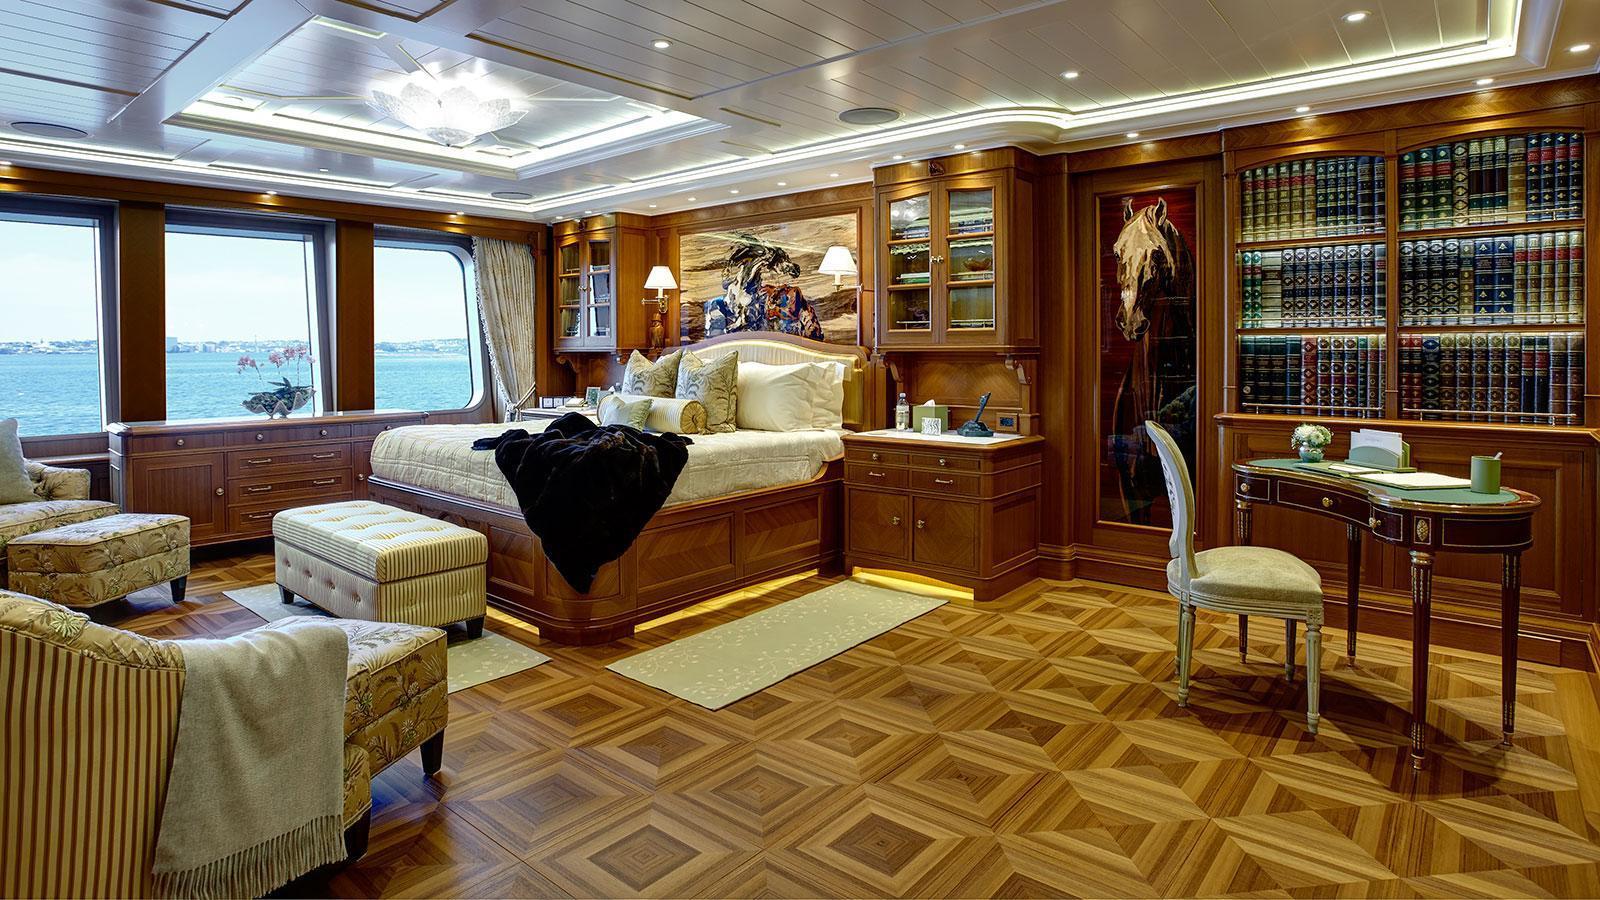 sea-owl-motor-yacht-feadship-2013-62m-stateroom